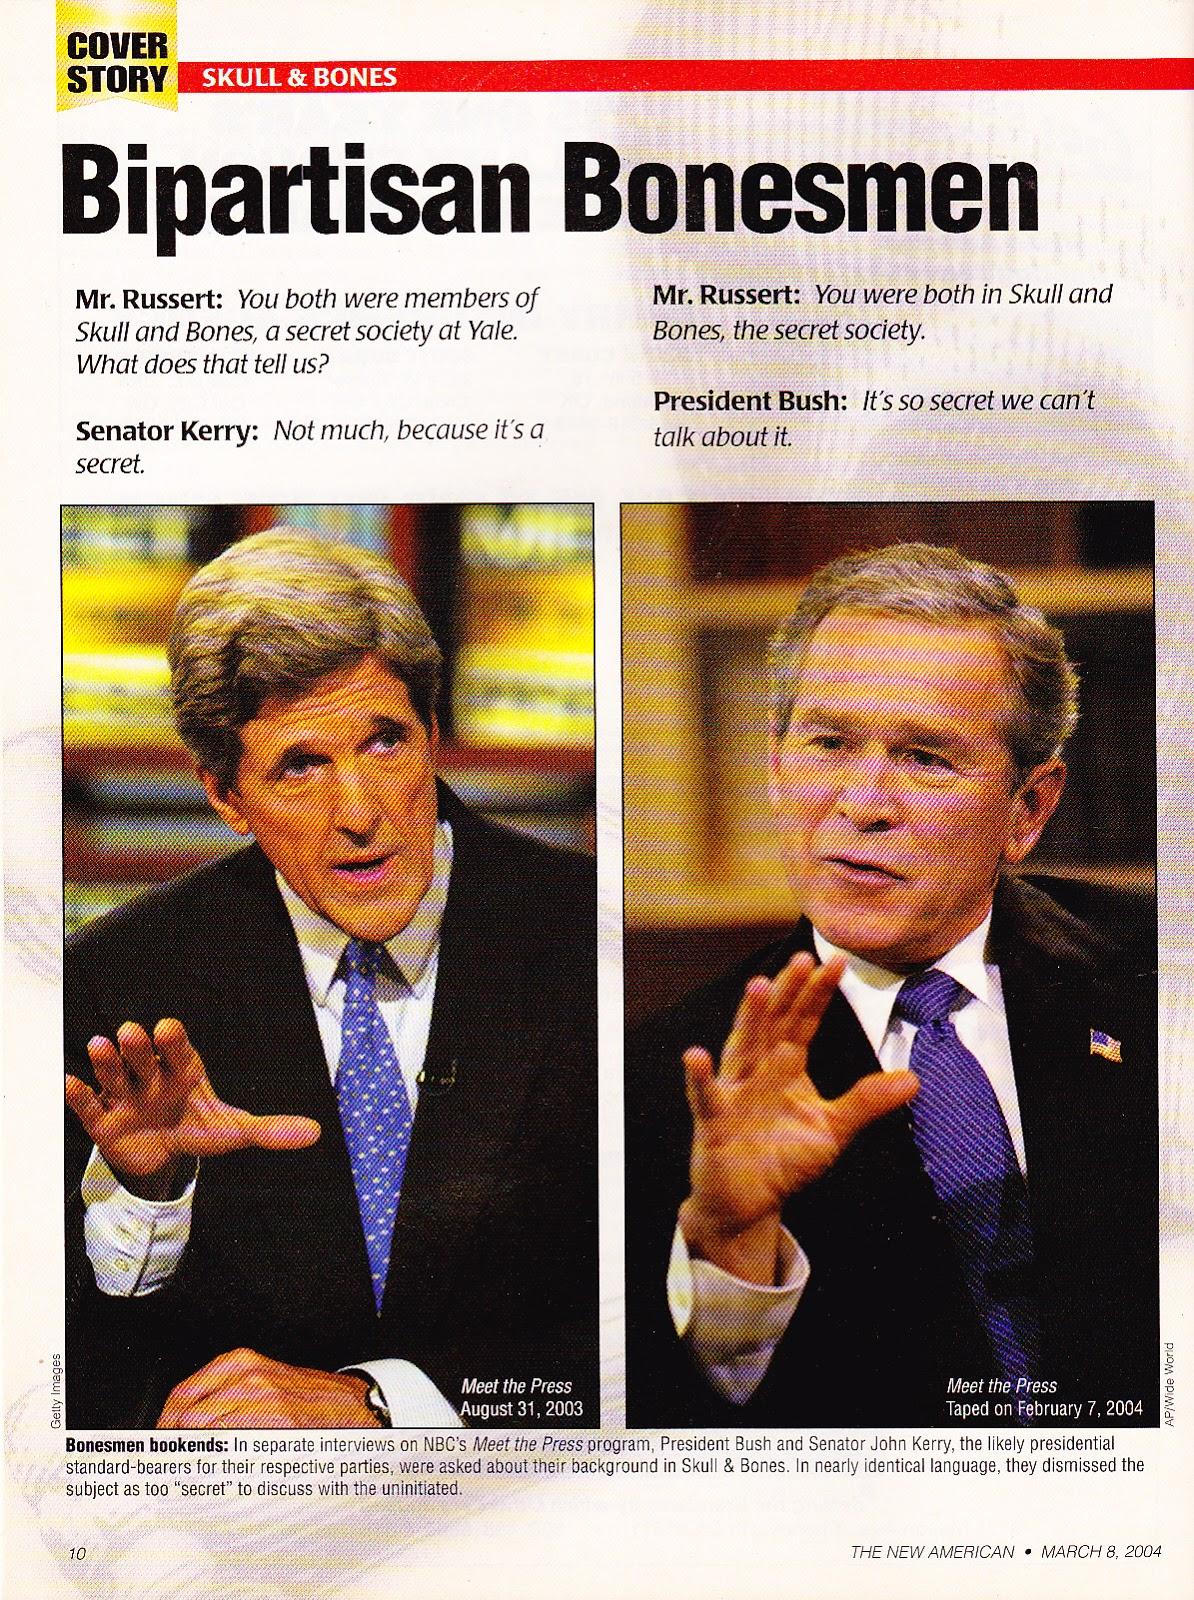 bipartisan bonesmen, new american mar 2004